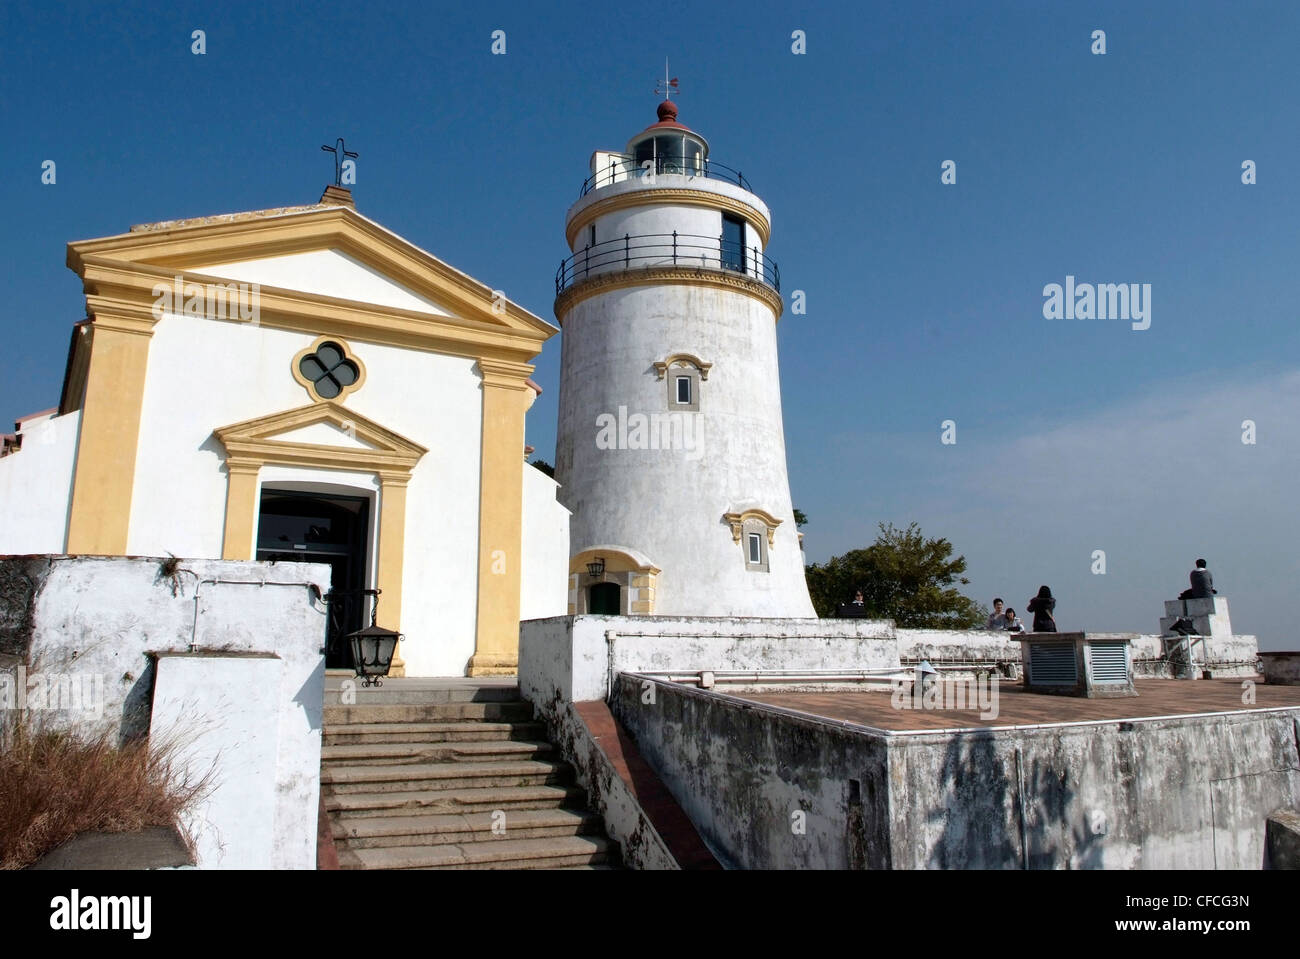 CHINA MACAU SAR Guia Fortress And Lighthouse Macau World - Where is macau in the world